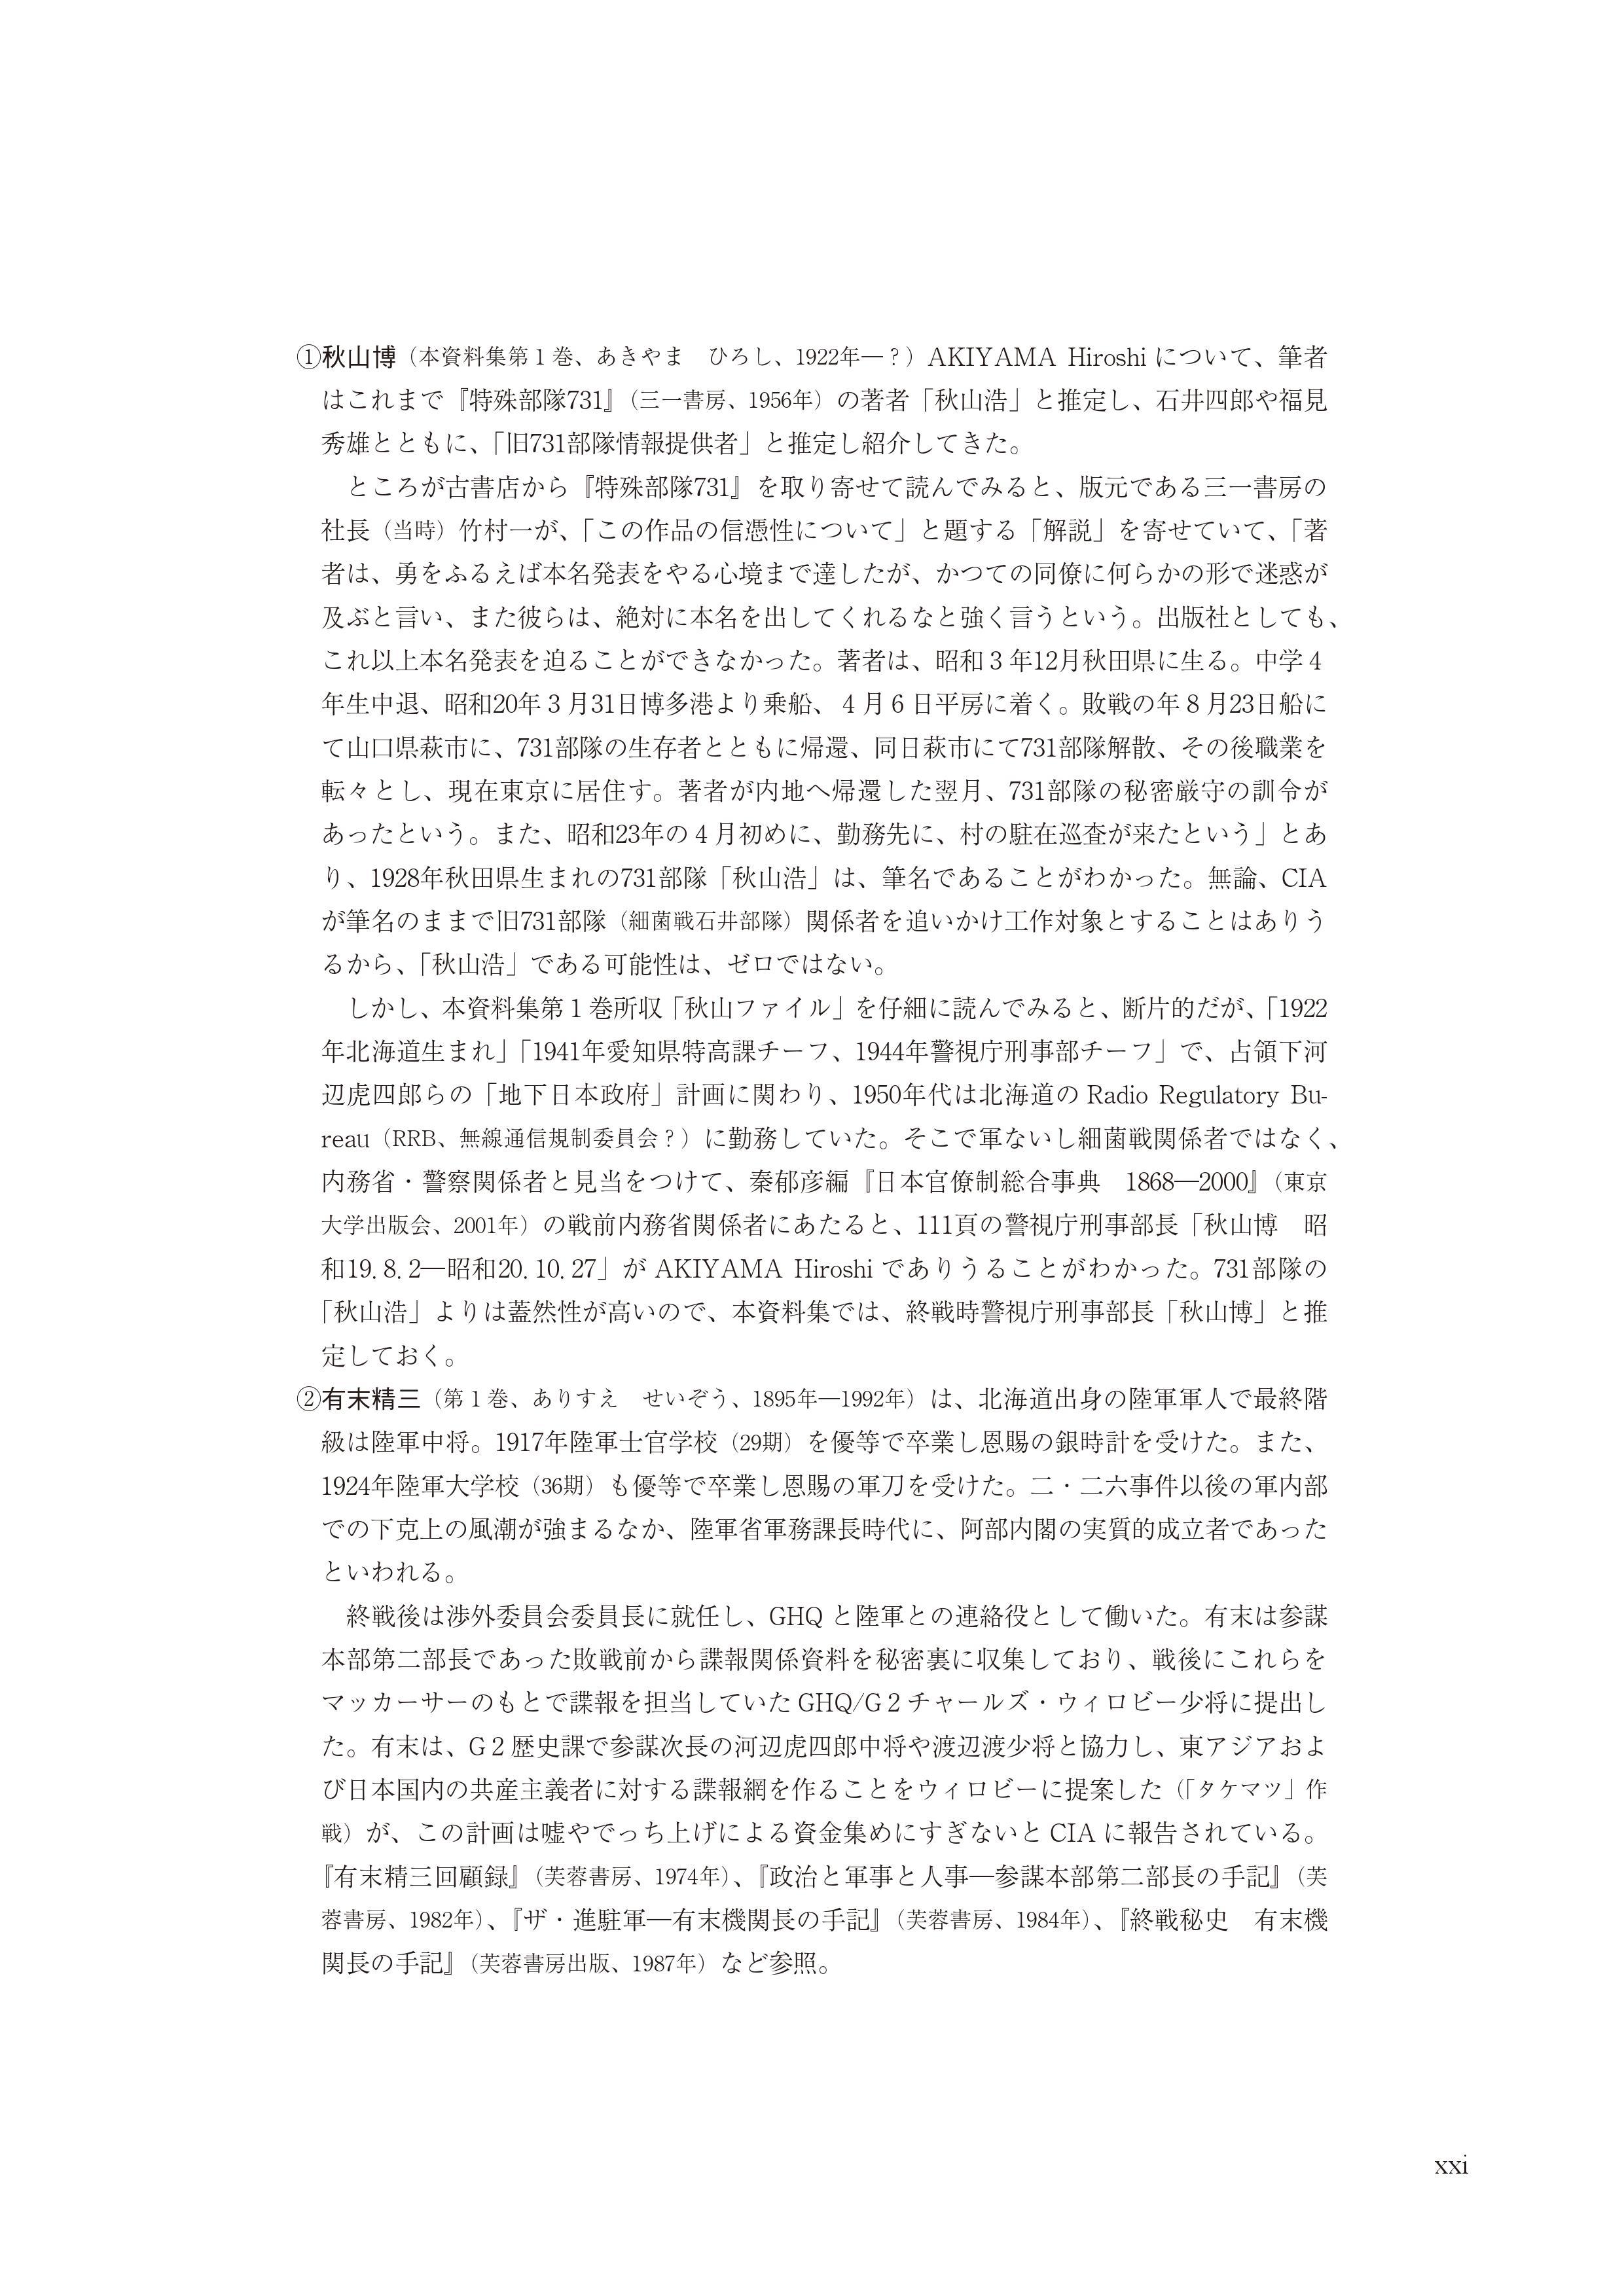 CIA日本人ファイル0001 (21)